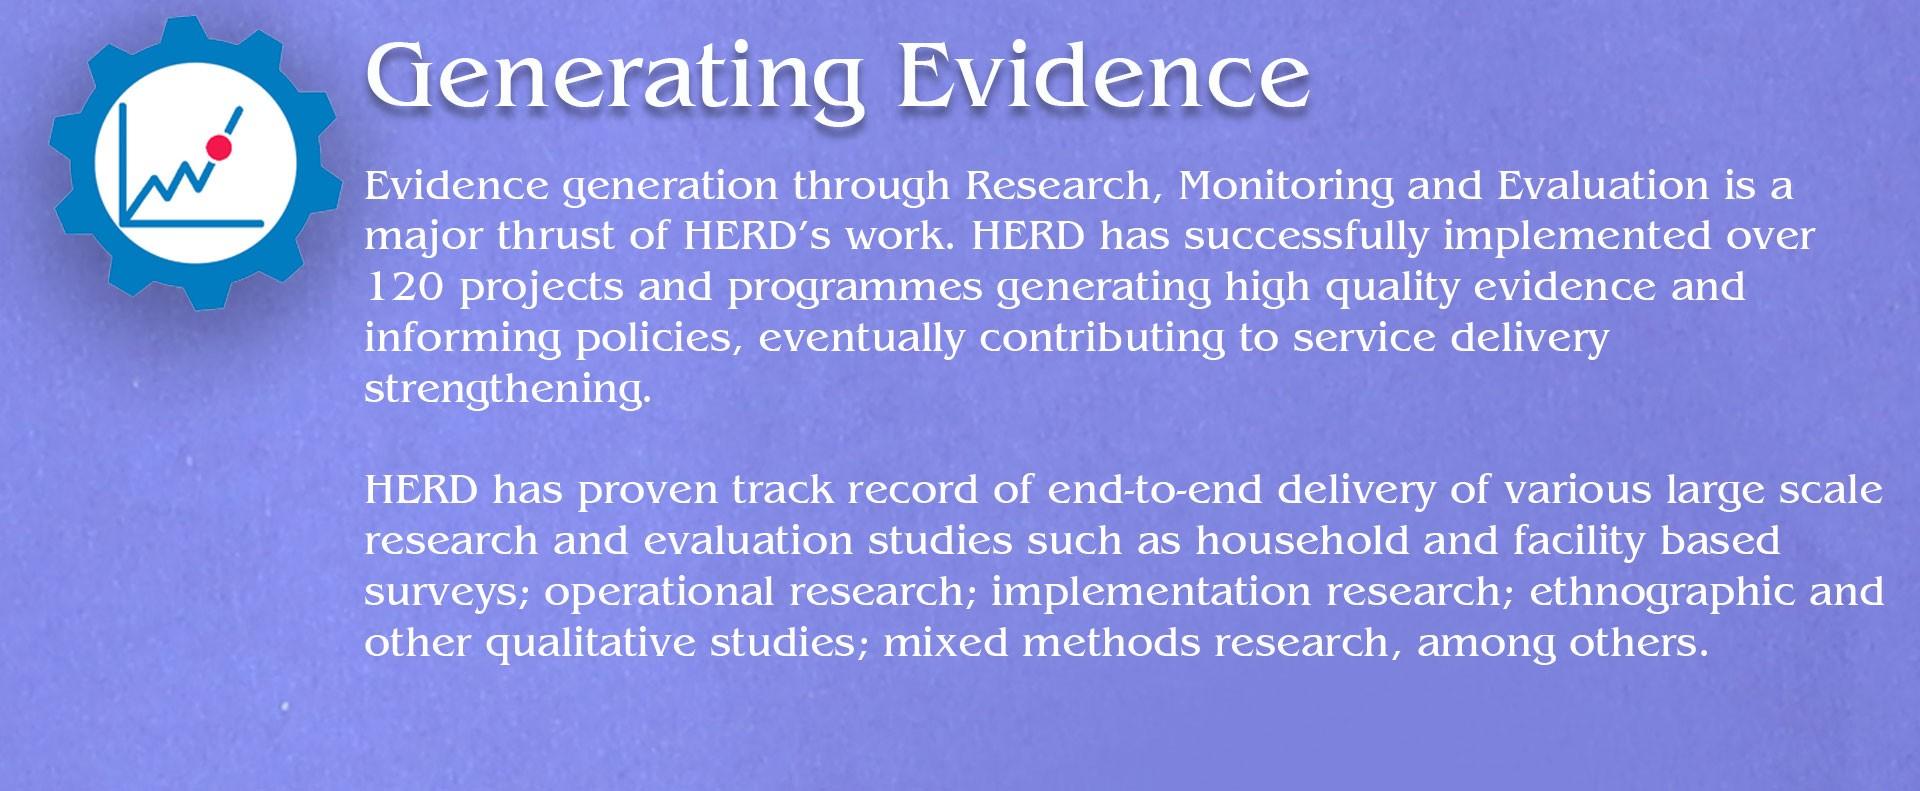 Generating Evidence